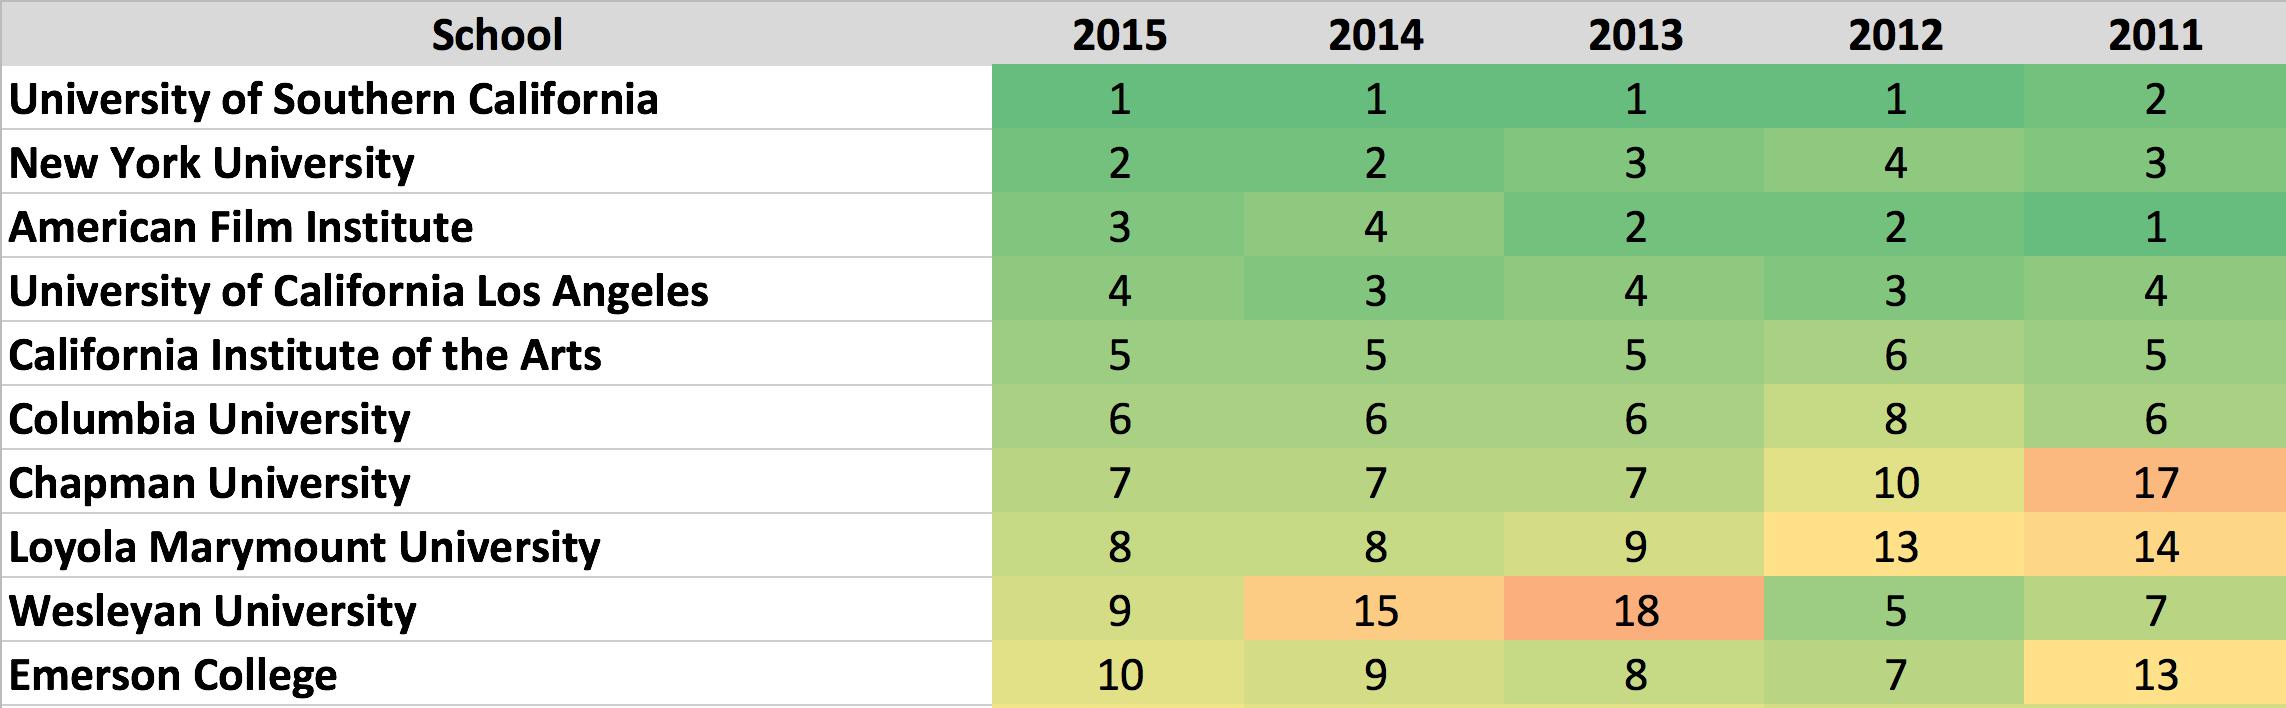 Top 25 Film School Rankings - Best Over Time